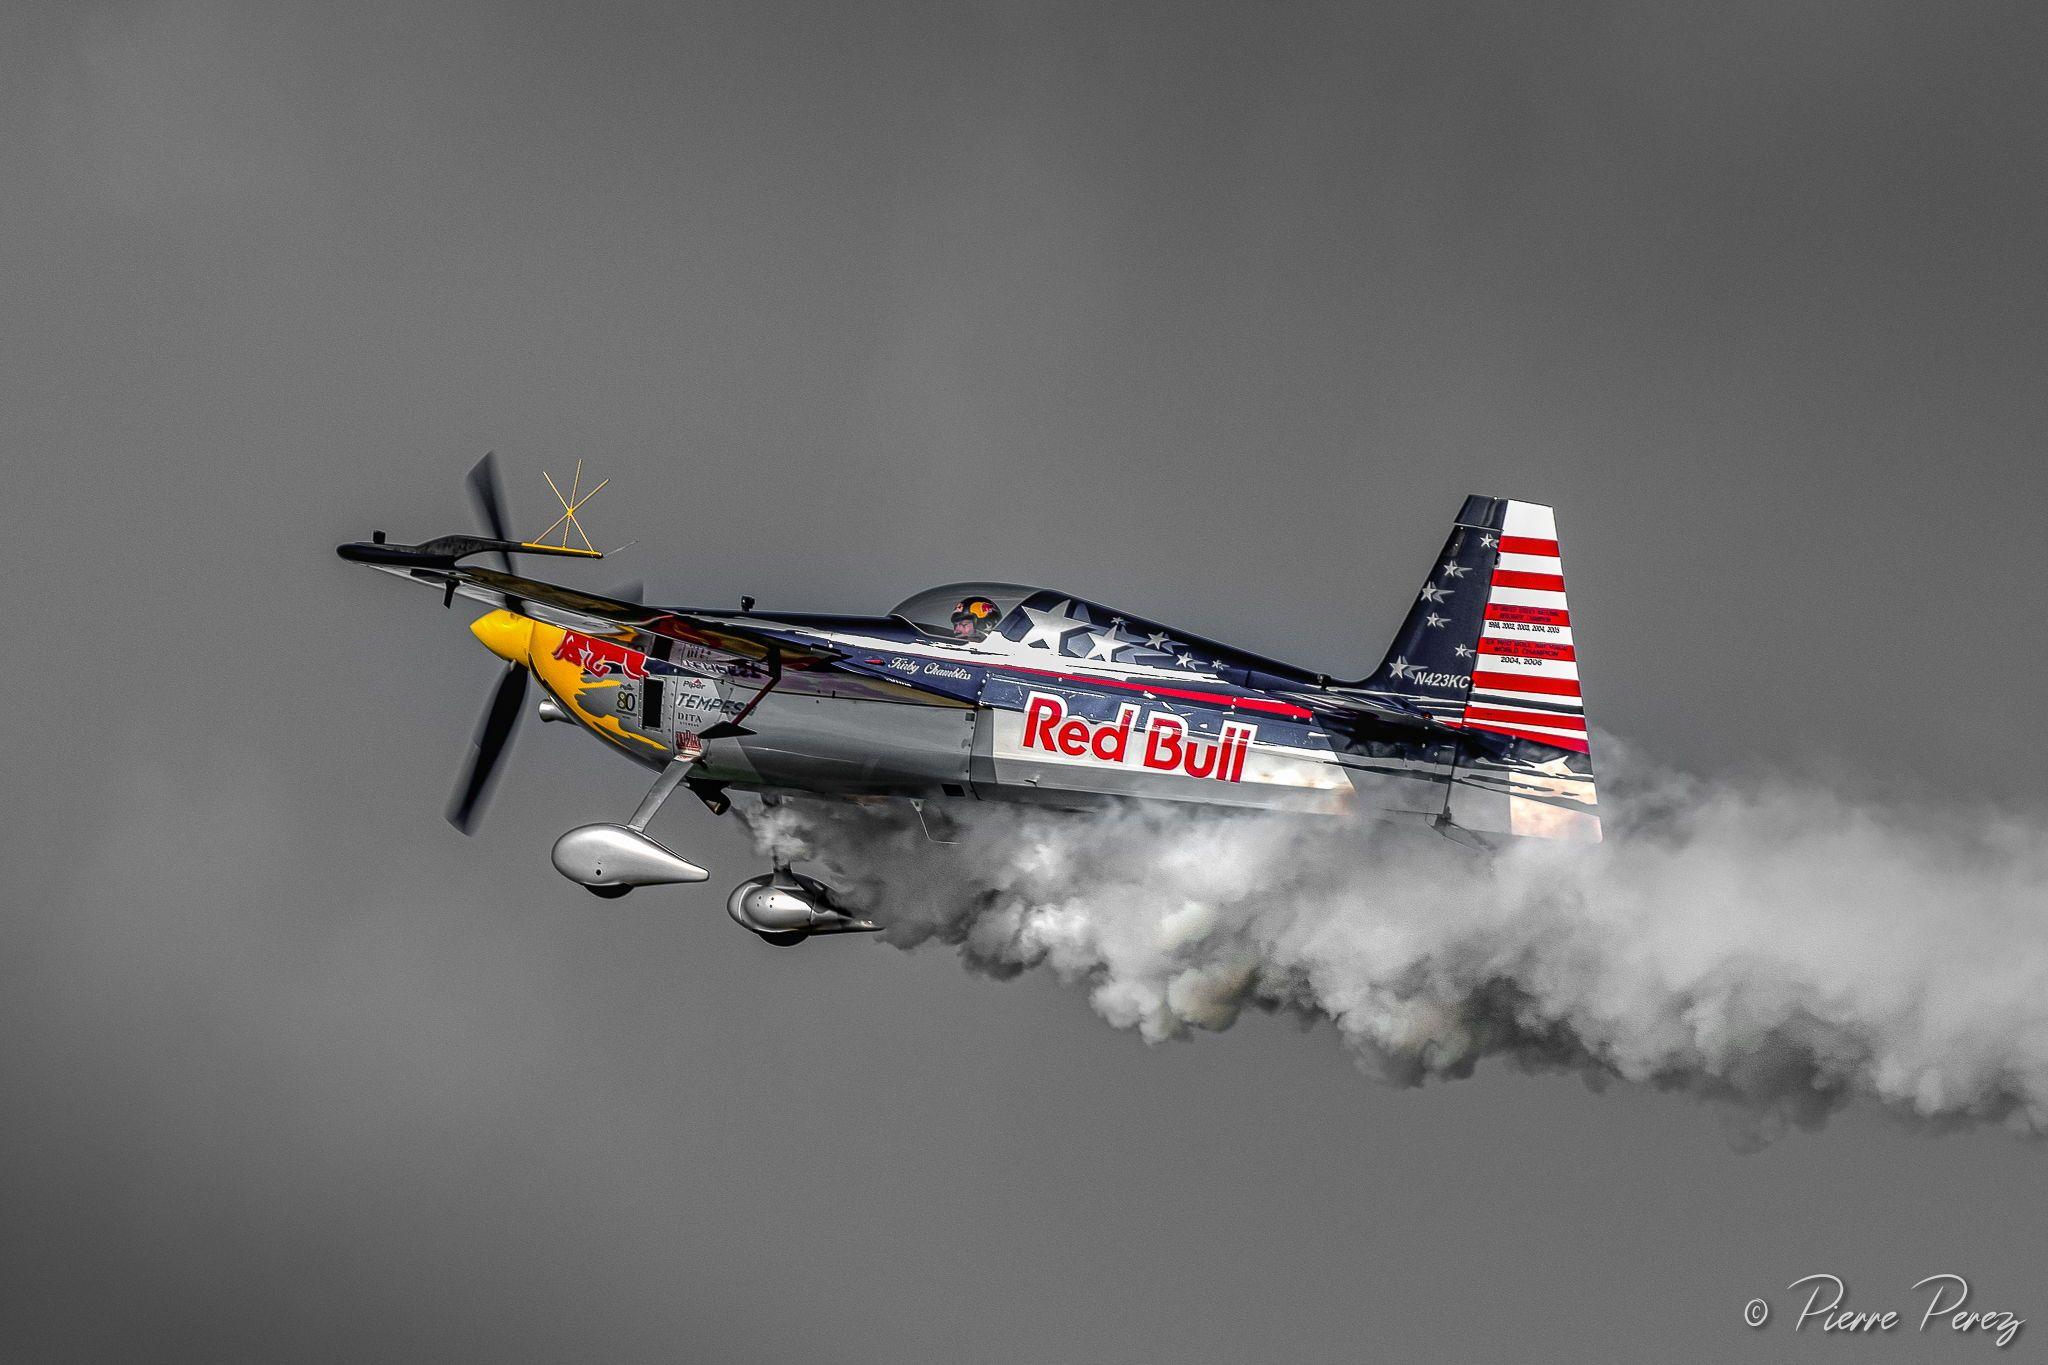 Redbull team airplane aircraft pilot Flight status